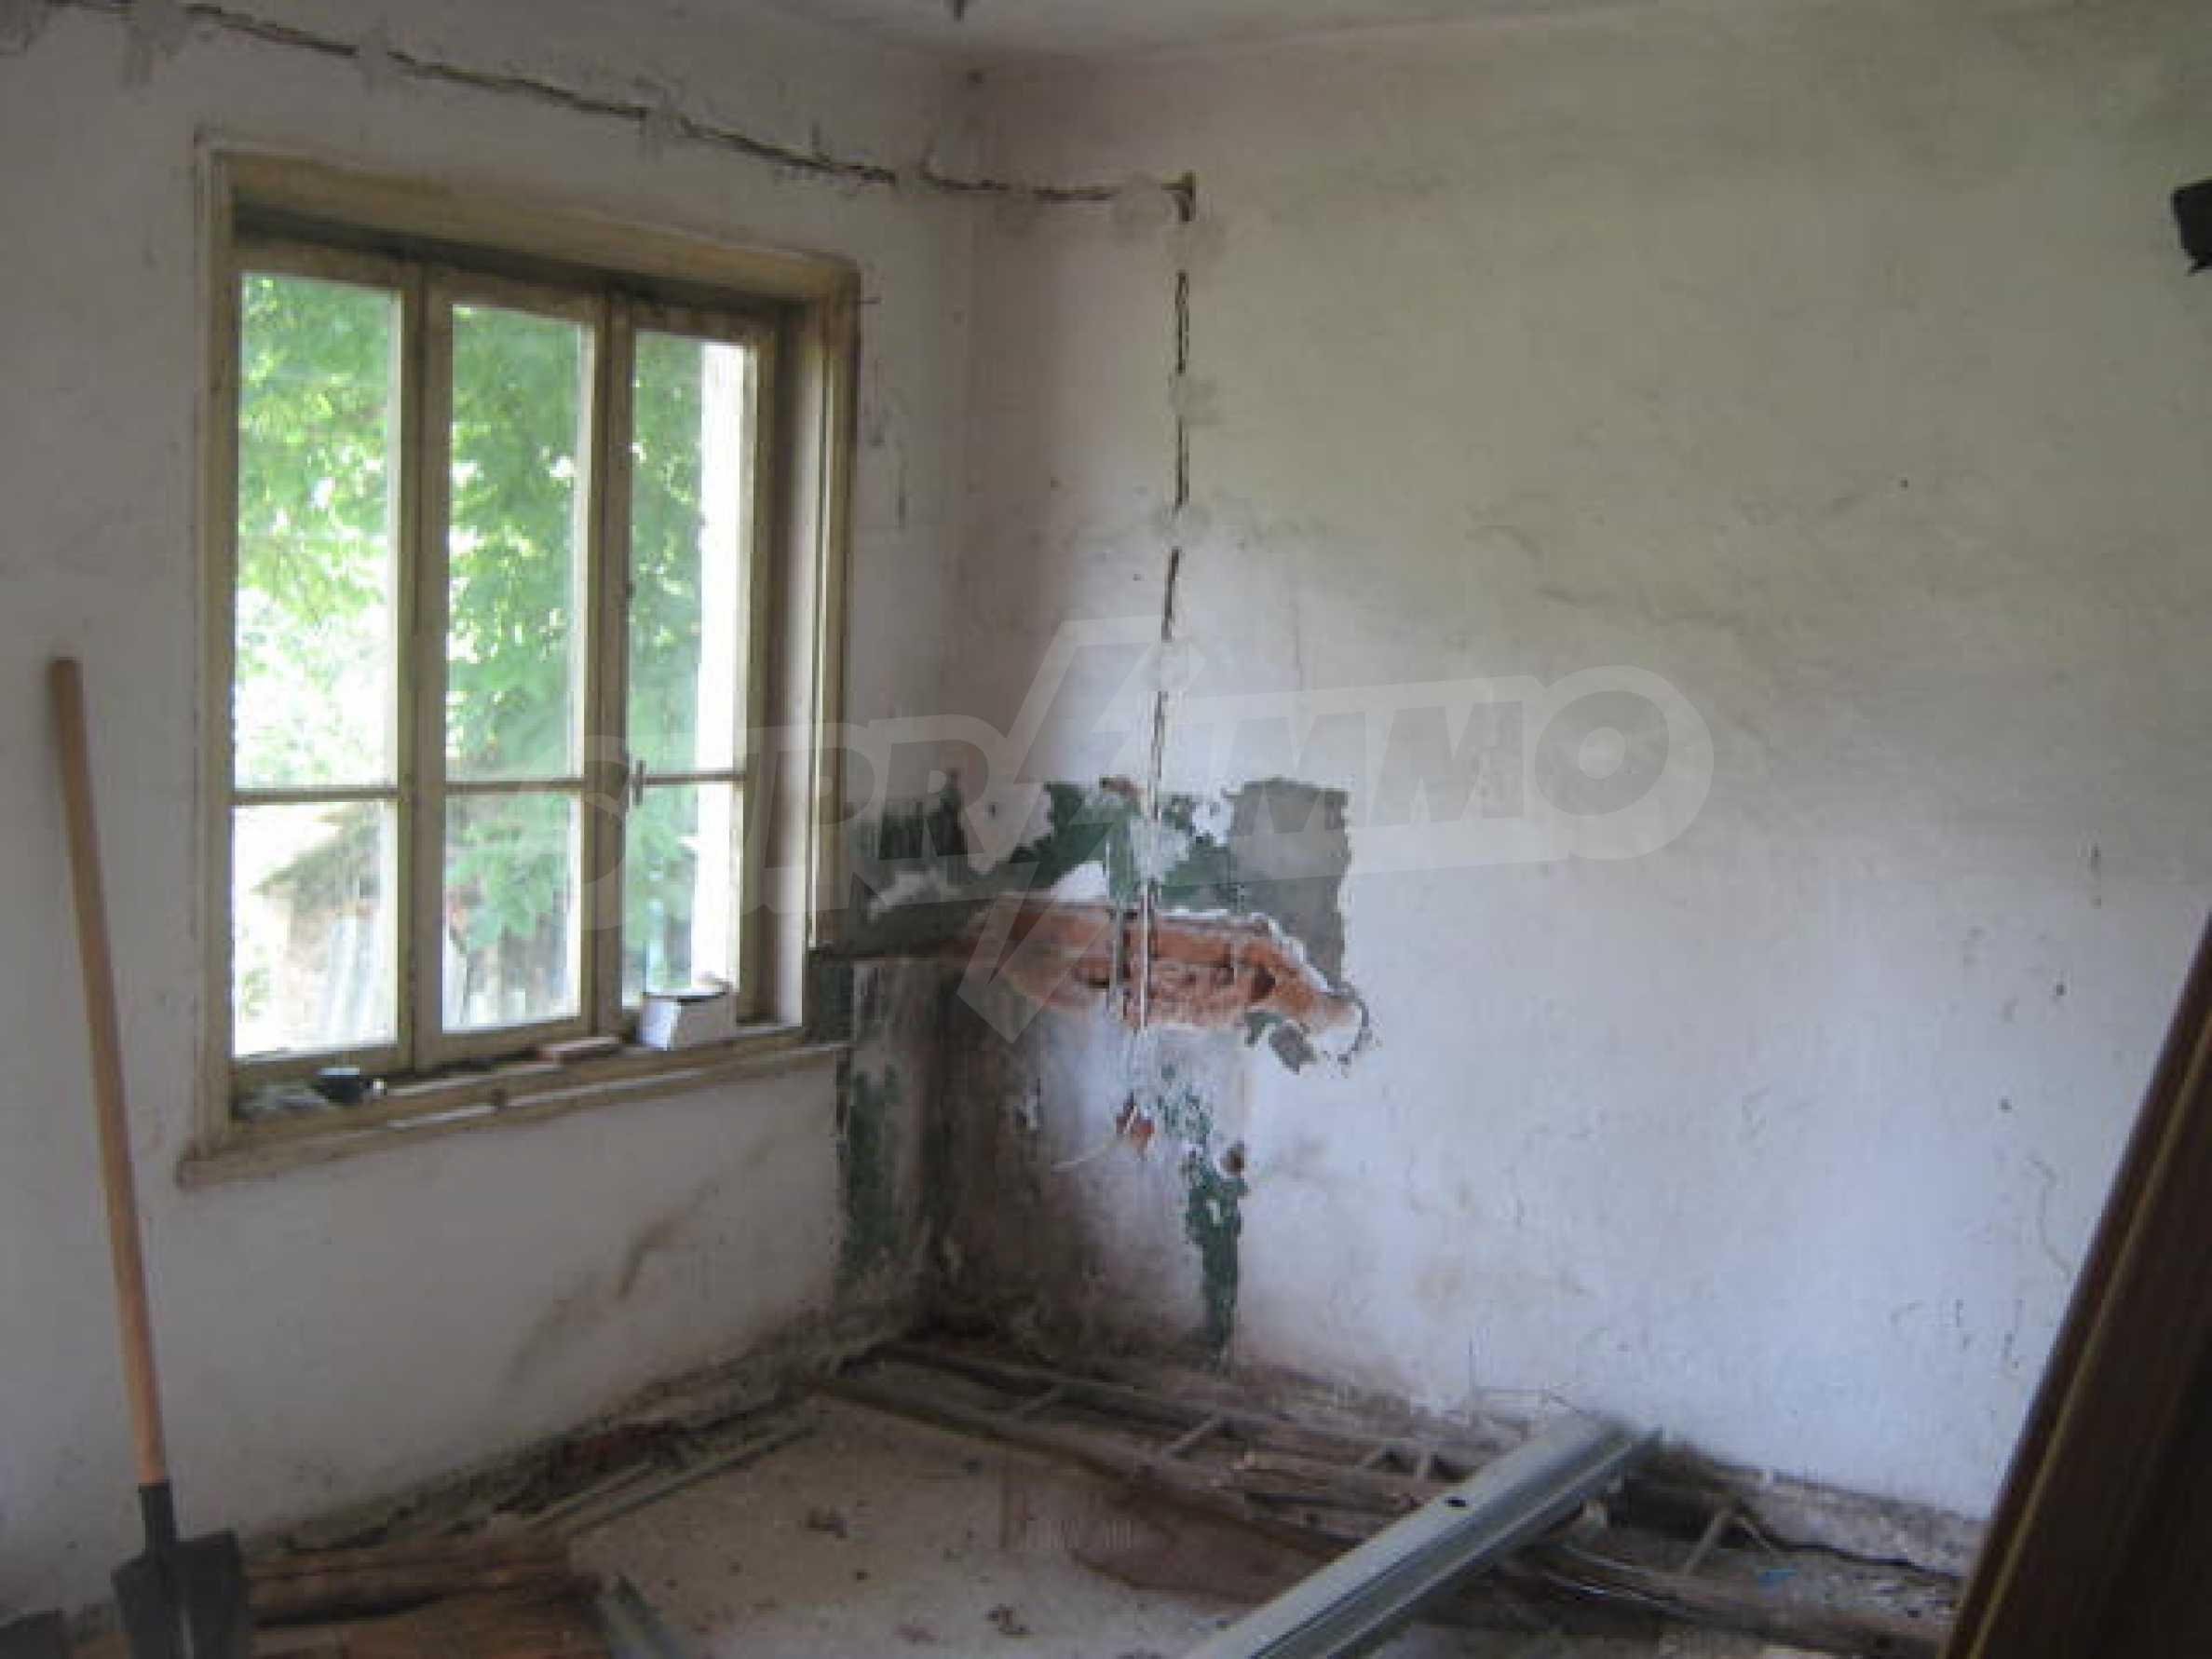 House for sale in village near Vidin 2